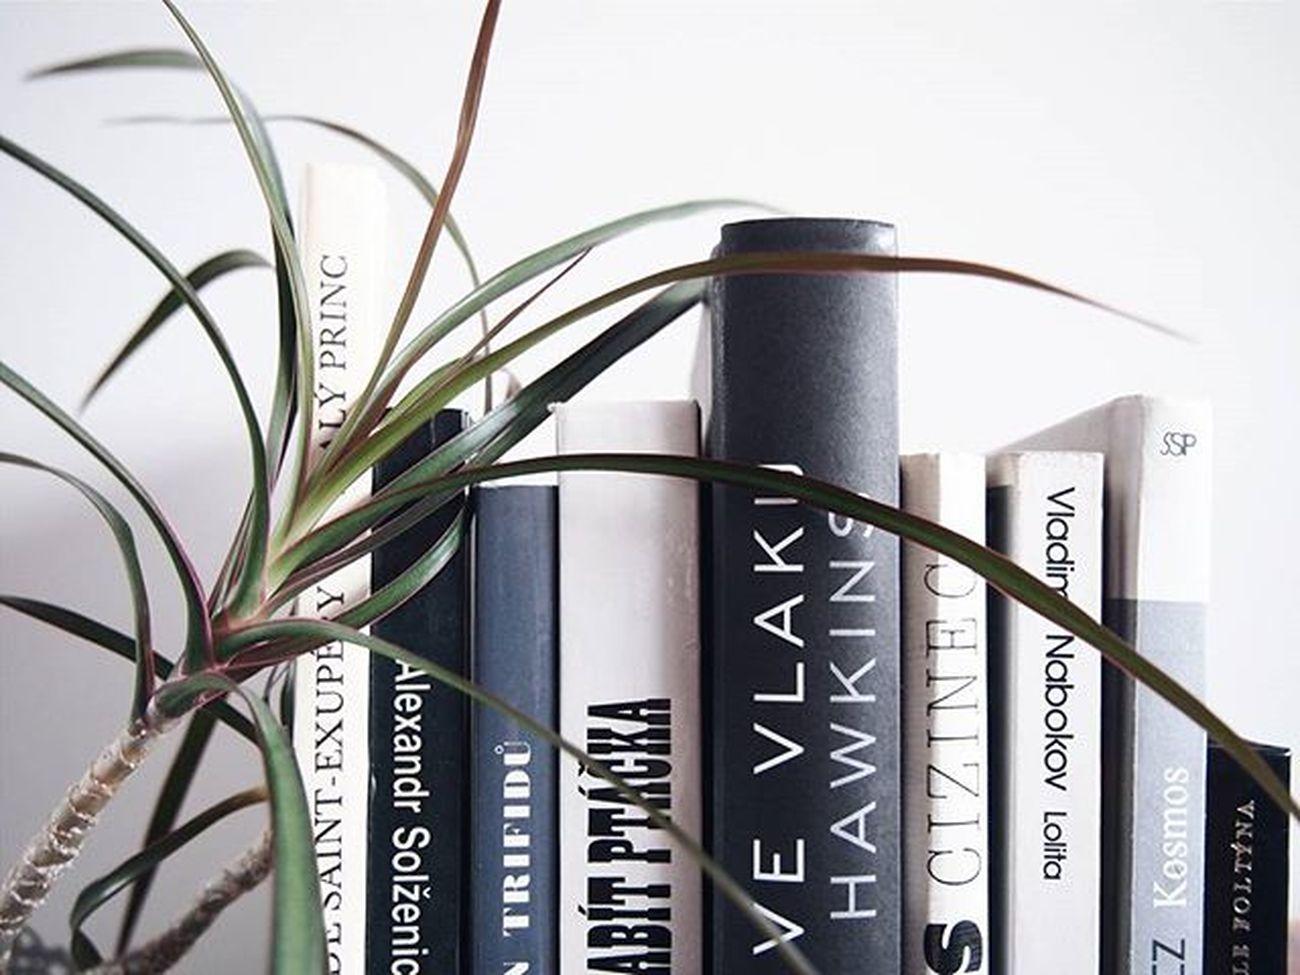 ❤⏩❄📖❄⏪❤ Book Bookstagram White Igers Igerscz VSCO Vscocam Picoftheday Instamood Booklover